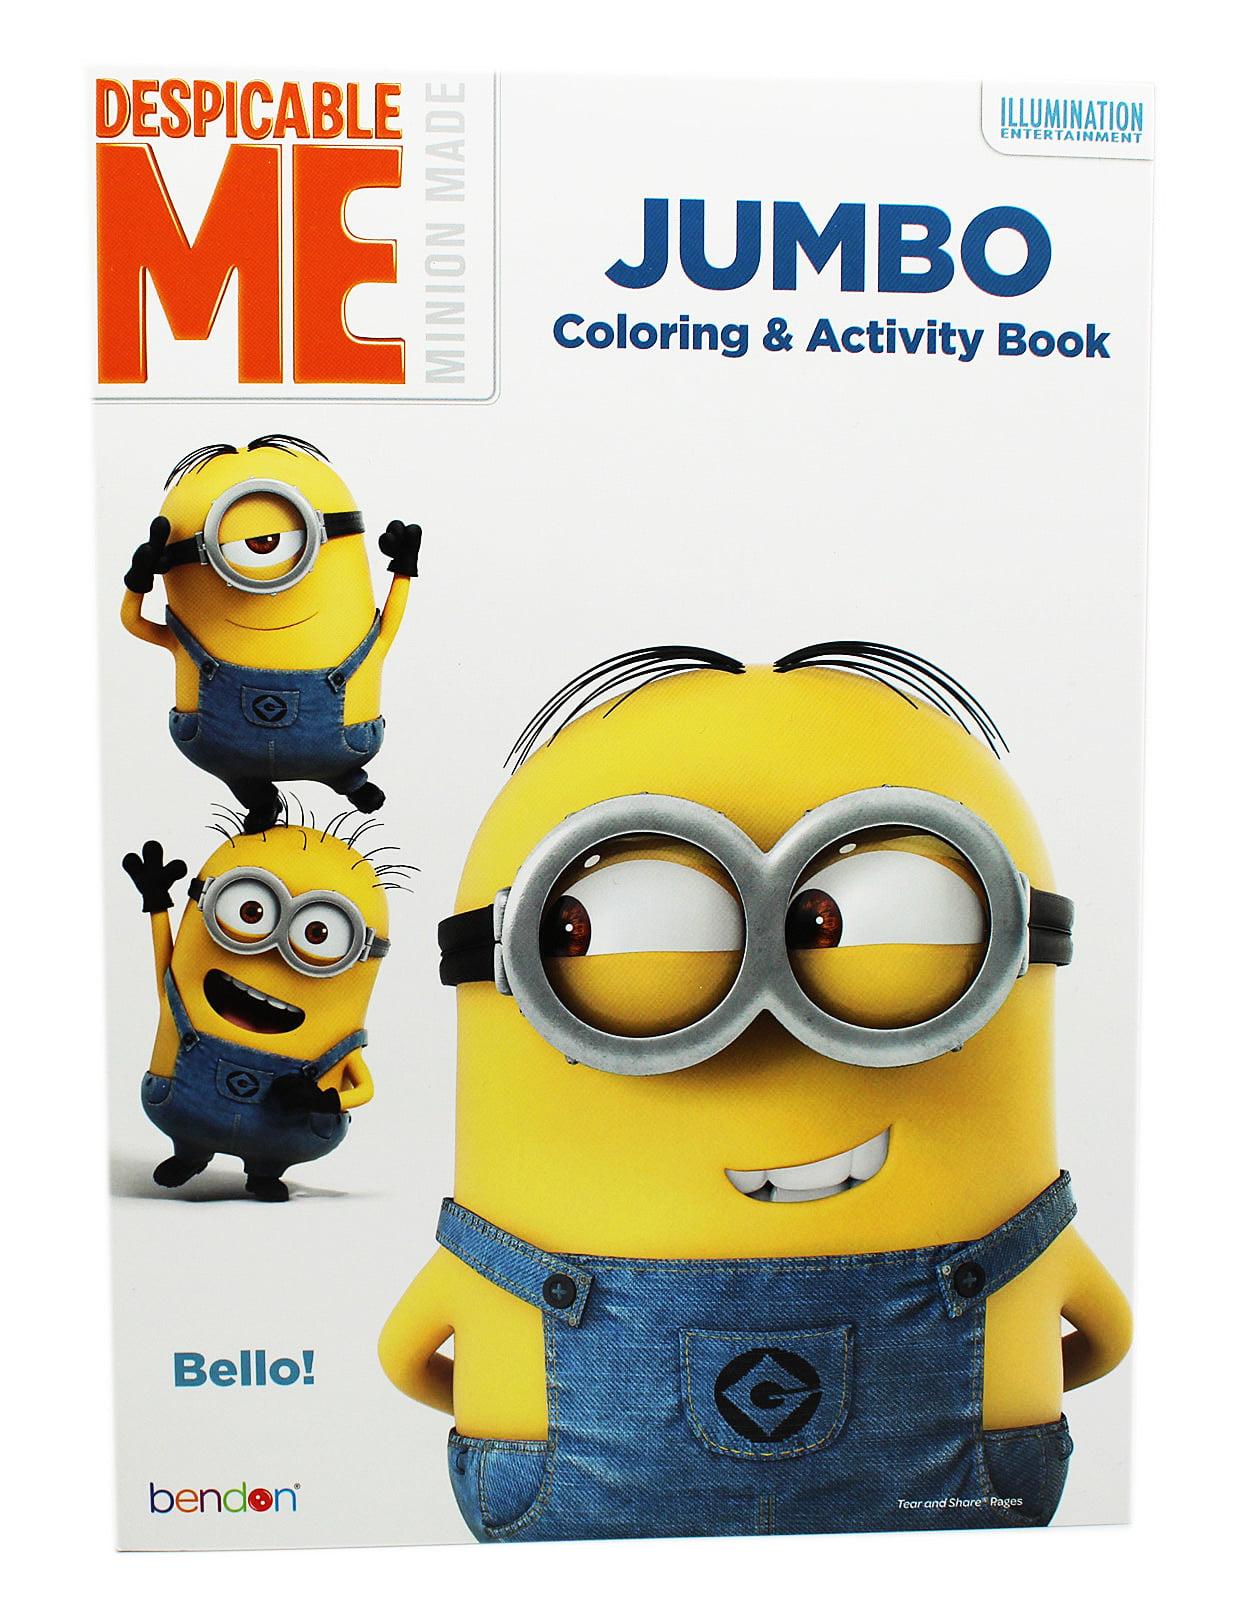 Despicable Me Minion Made Jumbo Coloring And Activity Book - Walmart.com -  Walmart.com